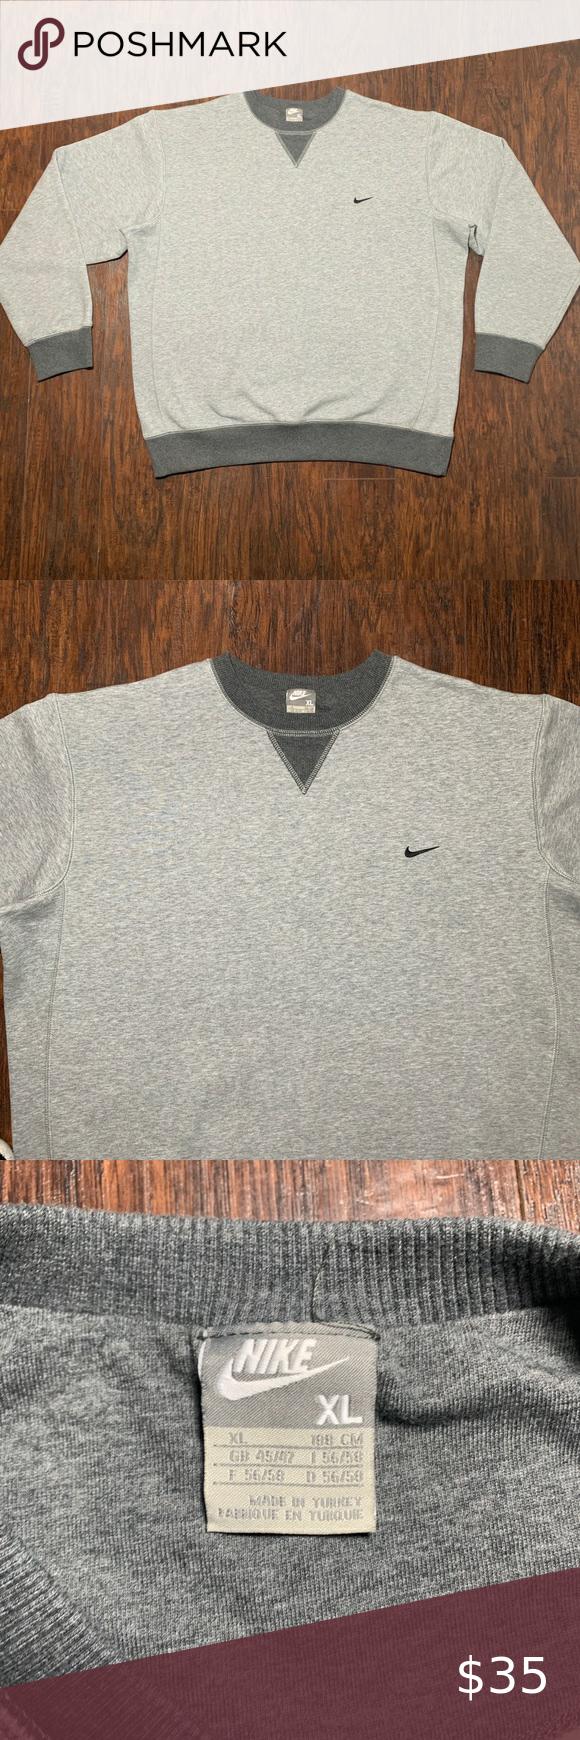 Nike Crewneck Sweatshirt Nike Crewneck Sweatshirt Nike Crewneck Crew Neck Sweatshirt [ 1740 x 580 Pixel ]